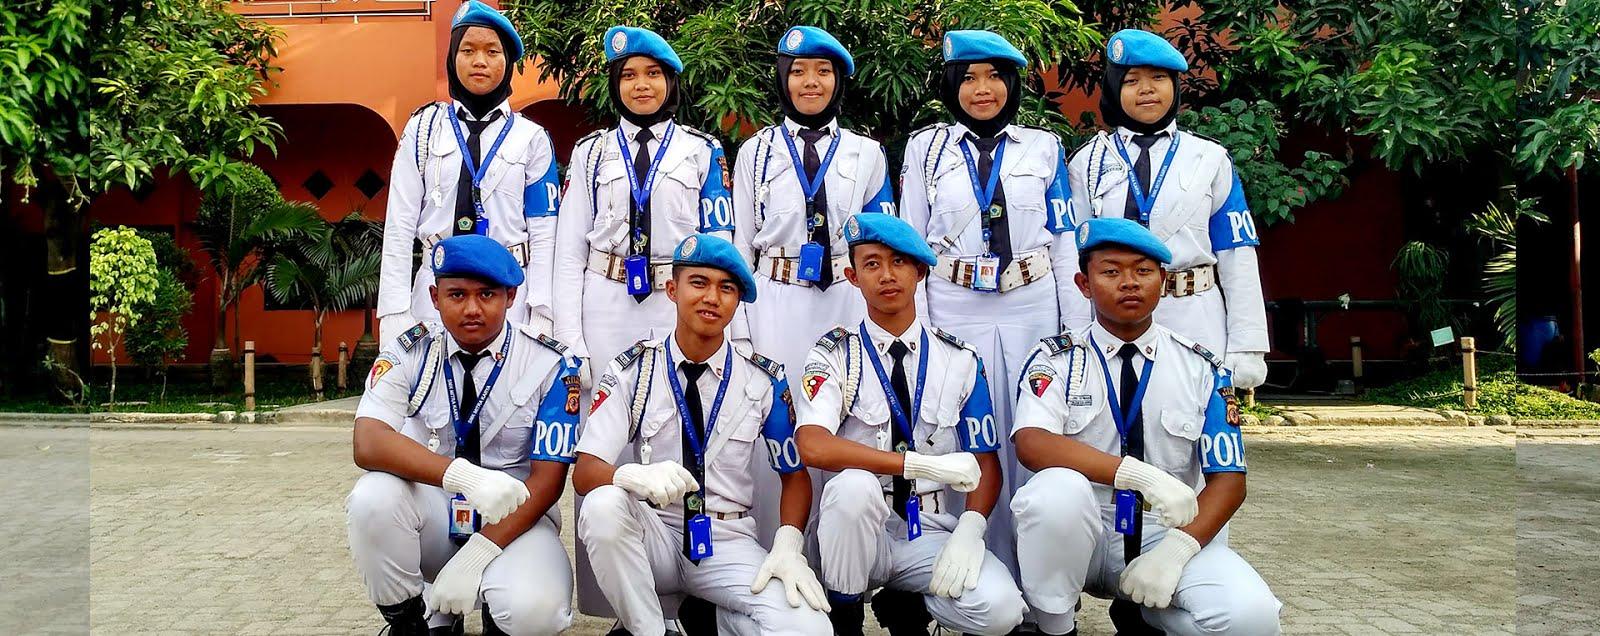 Polisi Siswa (POLSIS) SMK Mitra Karya